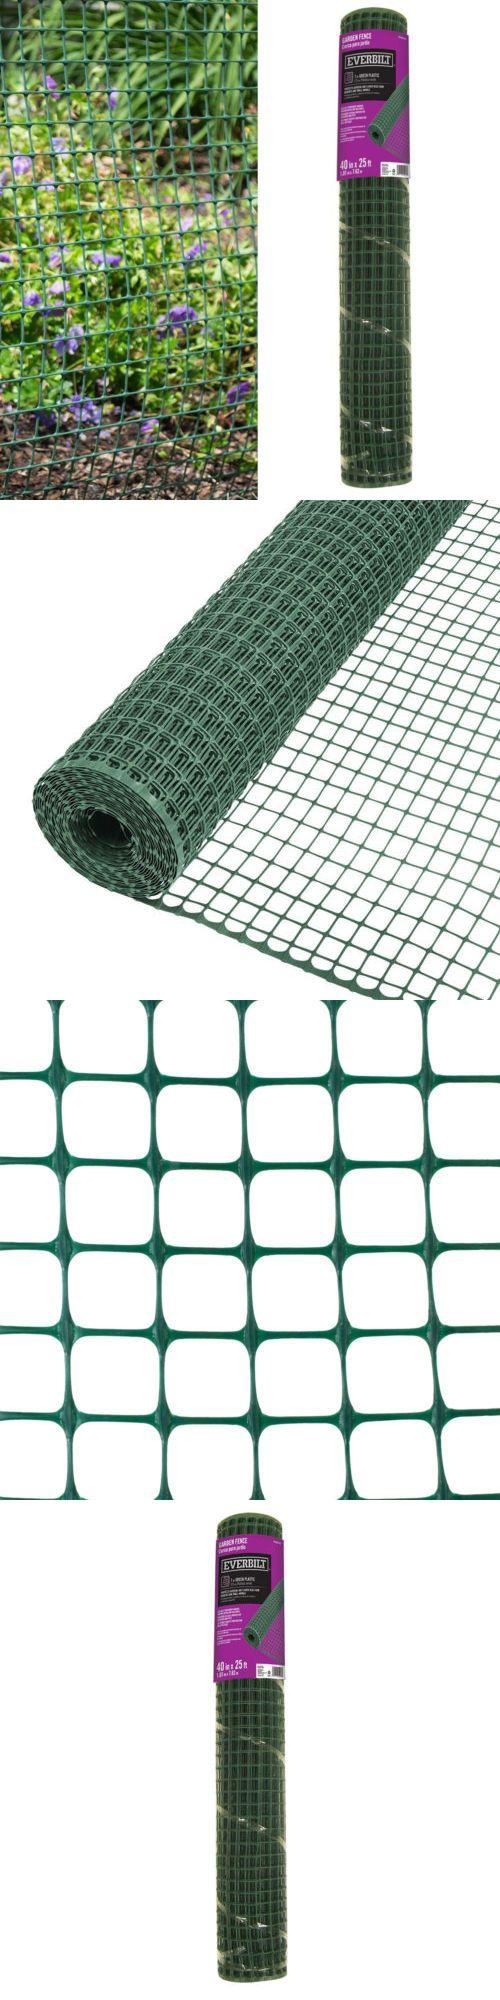 Hardware Cloth Metal Mesh 180985: Green Garden Wire Fence 40